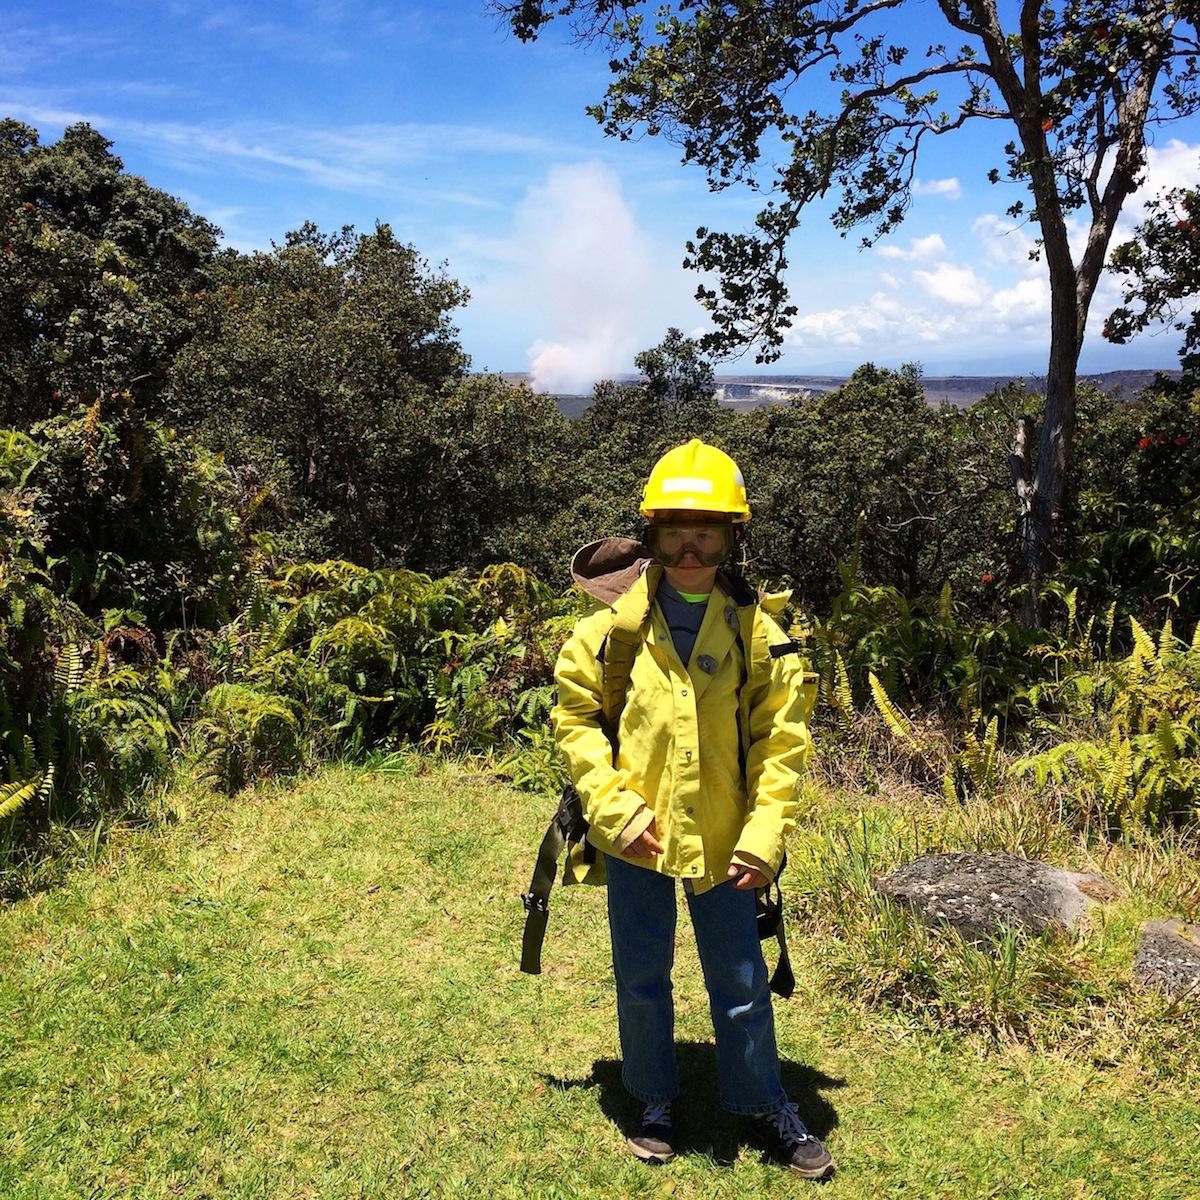 Kilauea Volcano gets active duringKeiki Wildland Firefighter photo-shoot.